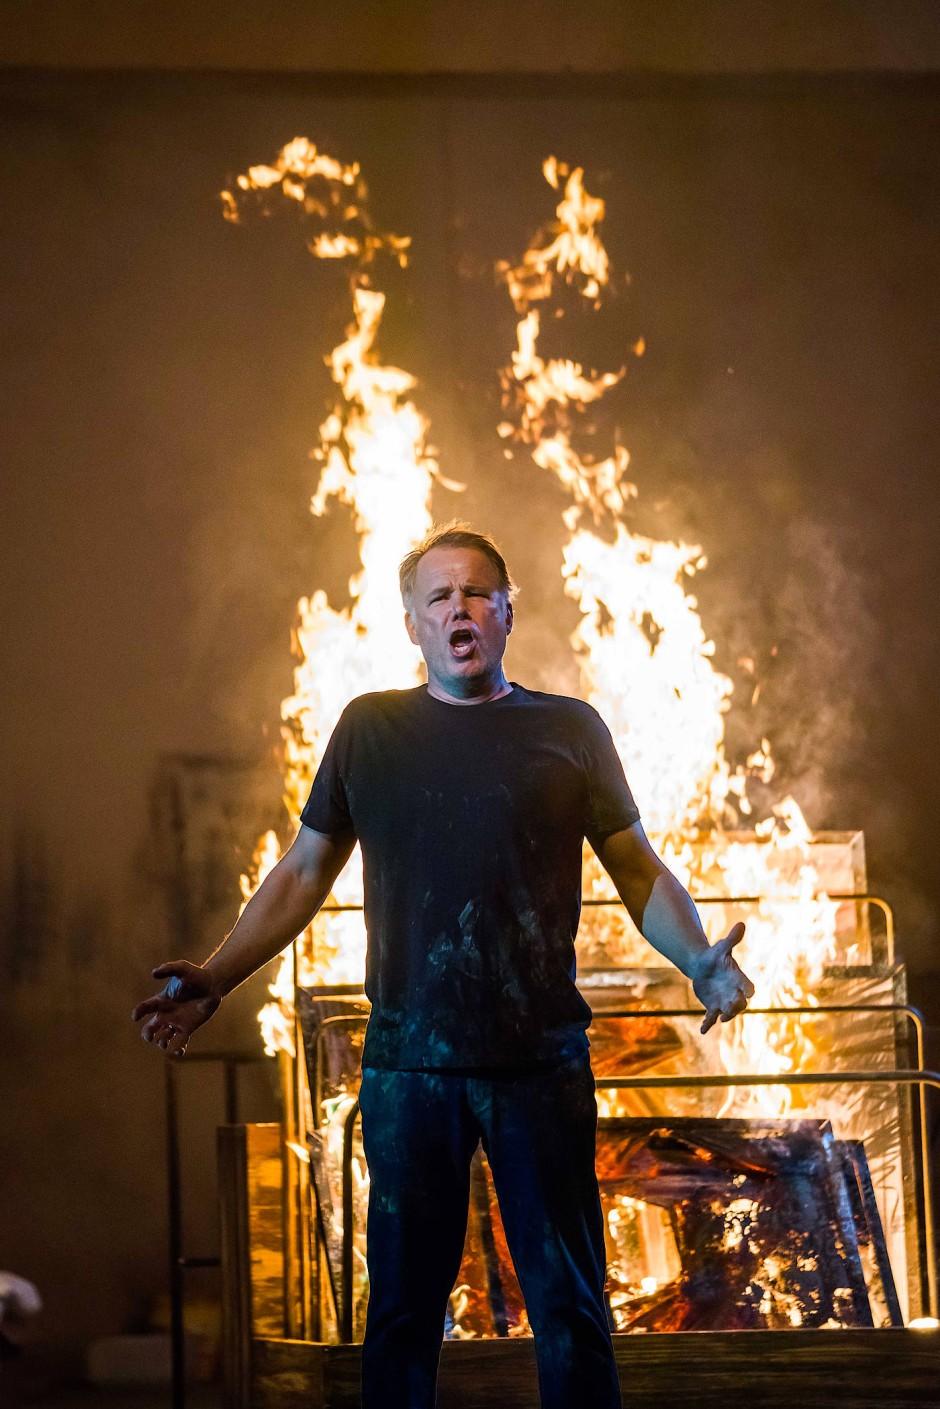 Lodernde Flammen: Blaubart (András Palerdi) zündet seine Bilder an.